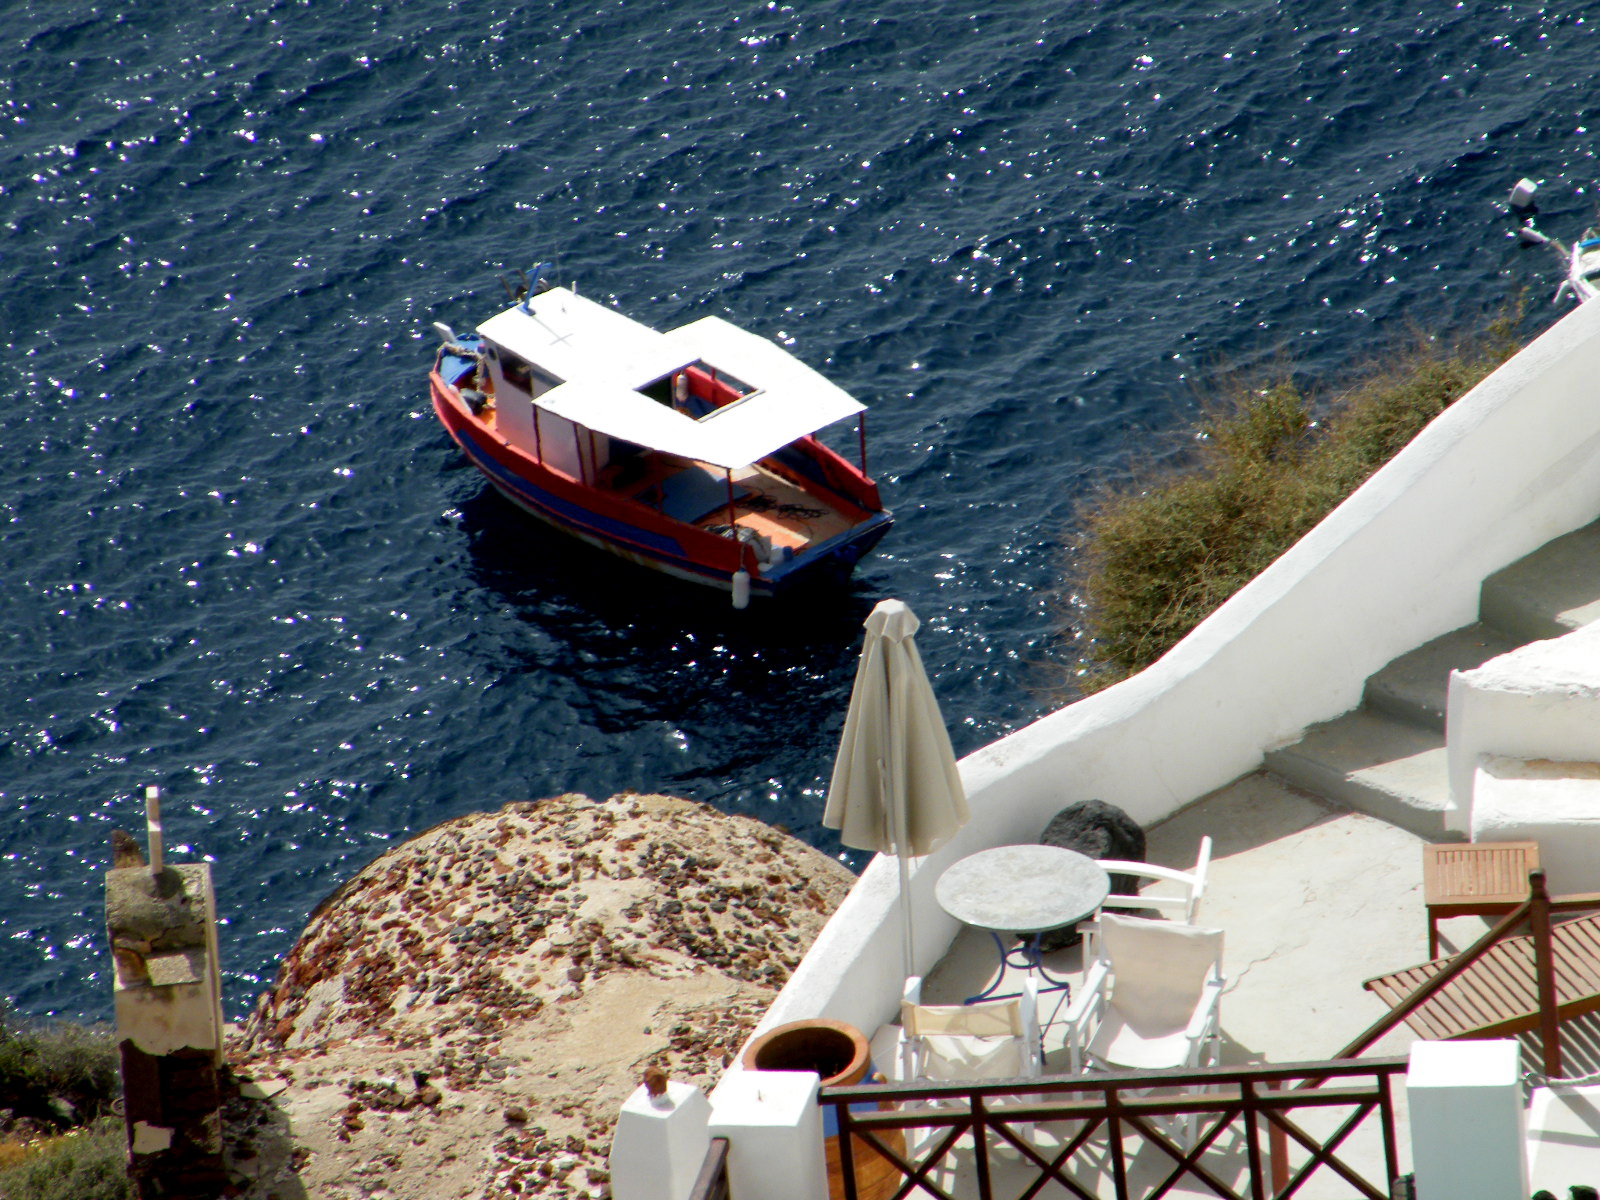 Greek Architecture, Architecture, Boat, Buildings, Greece, HQ Photo